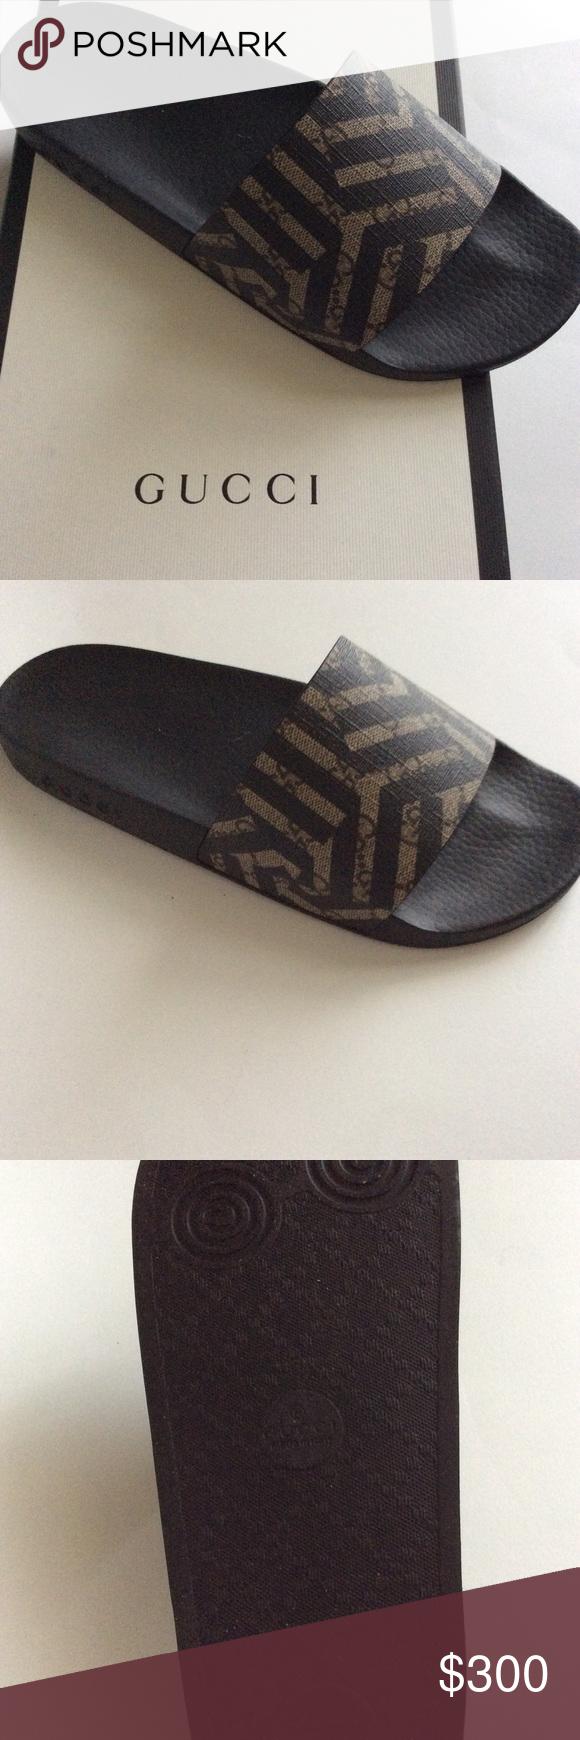 505cc8197c0 Gucci Gg Slide Sandals New